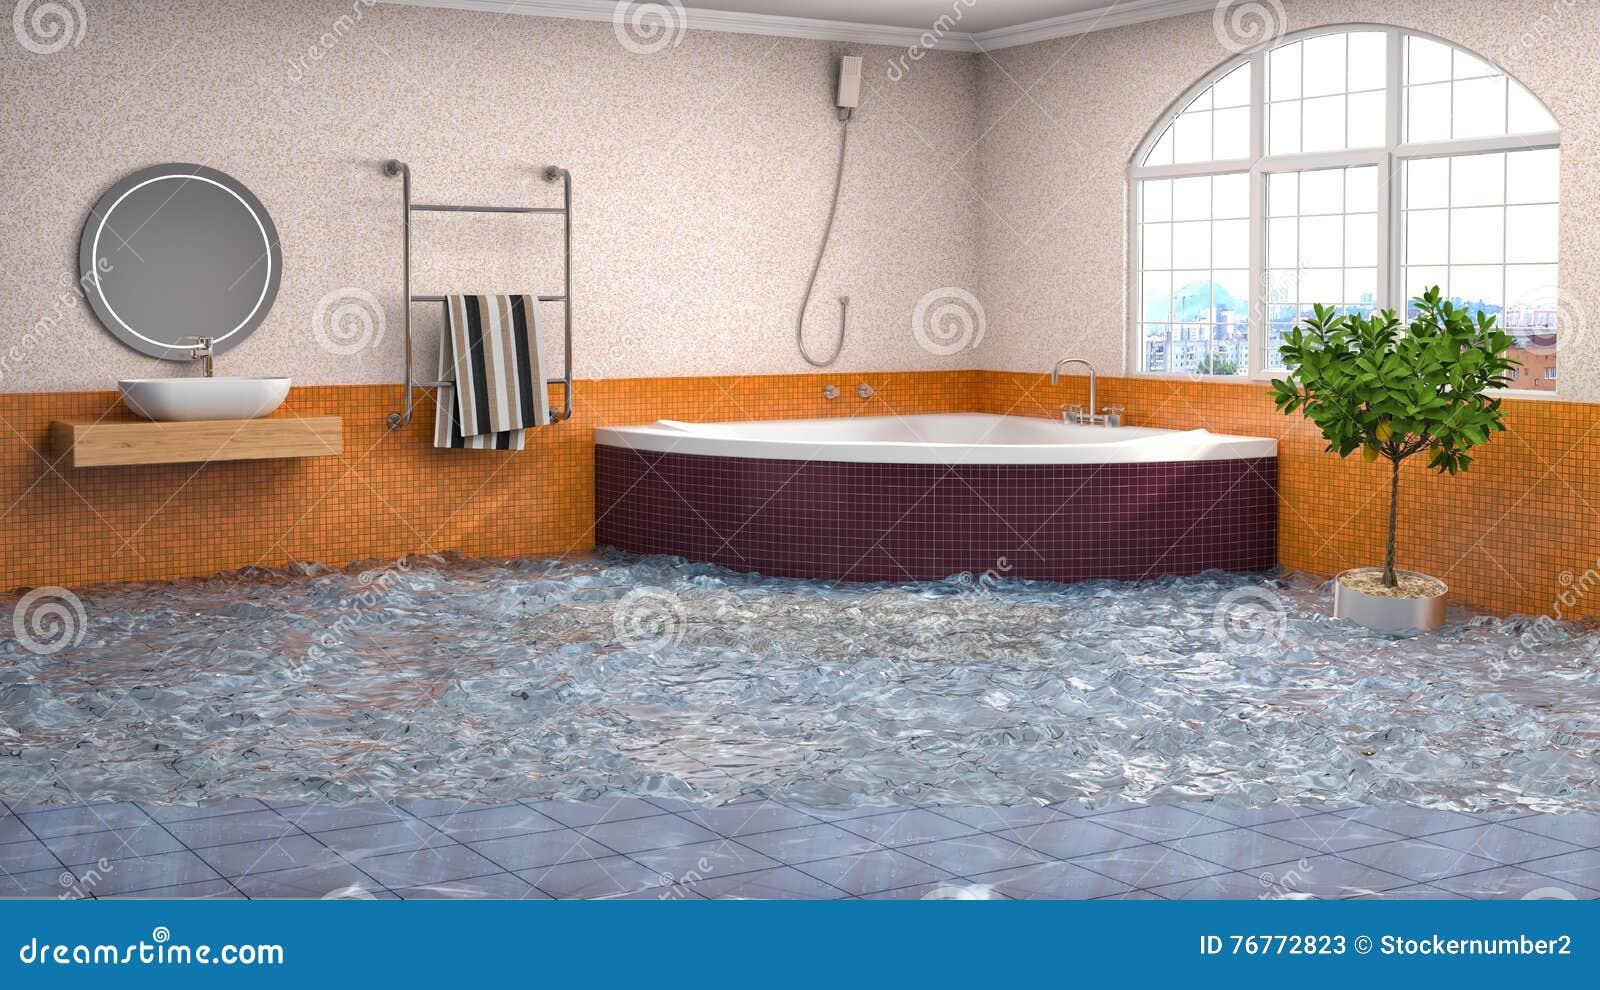 innenraum des hauses überschwemmt mit wasser abbildung 3d stock, Badezimmer ideen